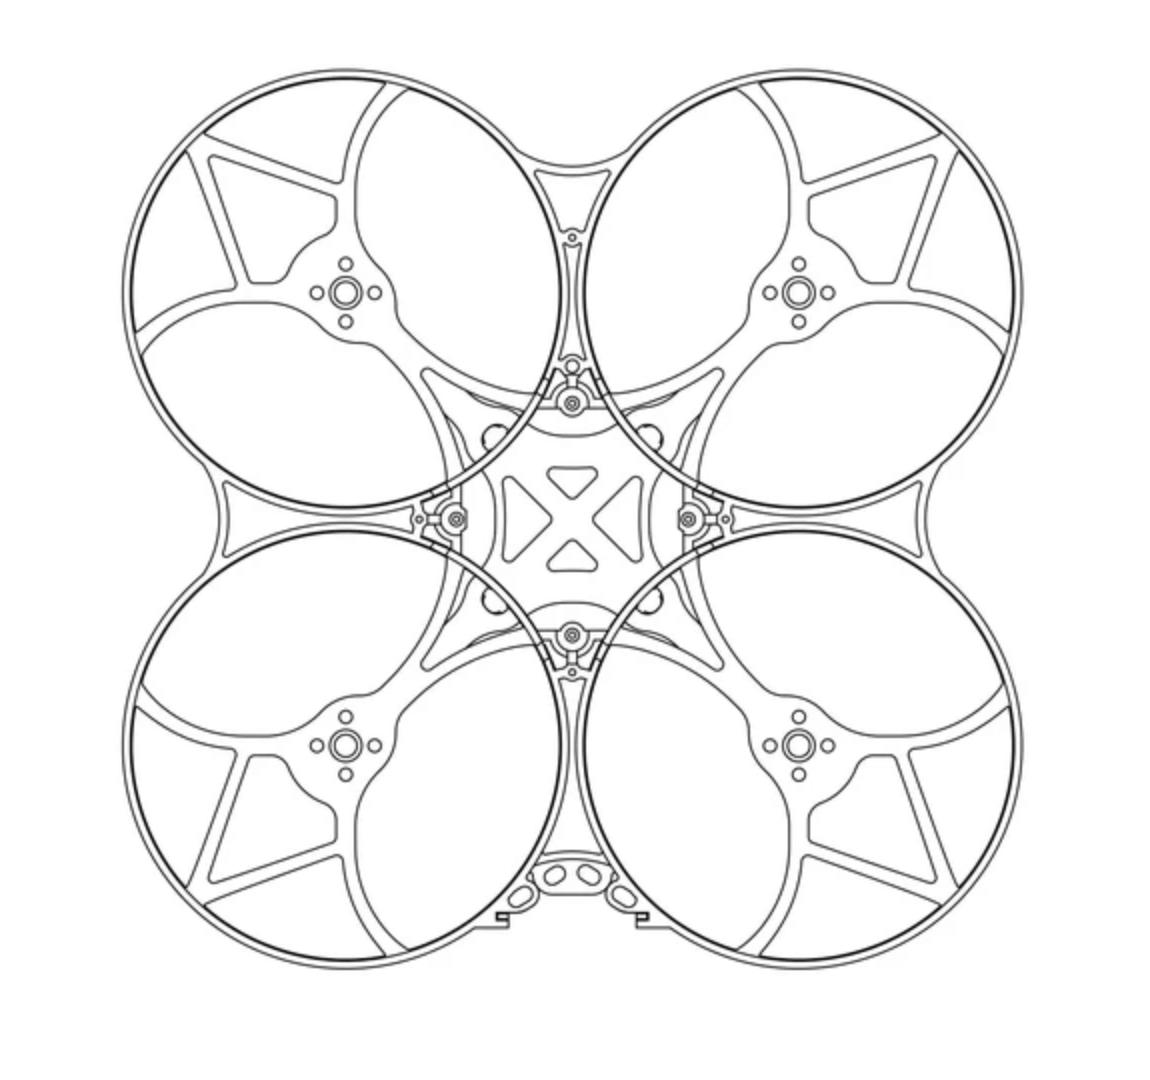 betafpc 95x frame kit diagram